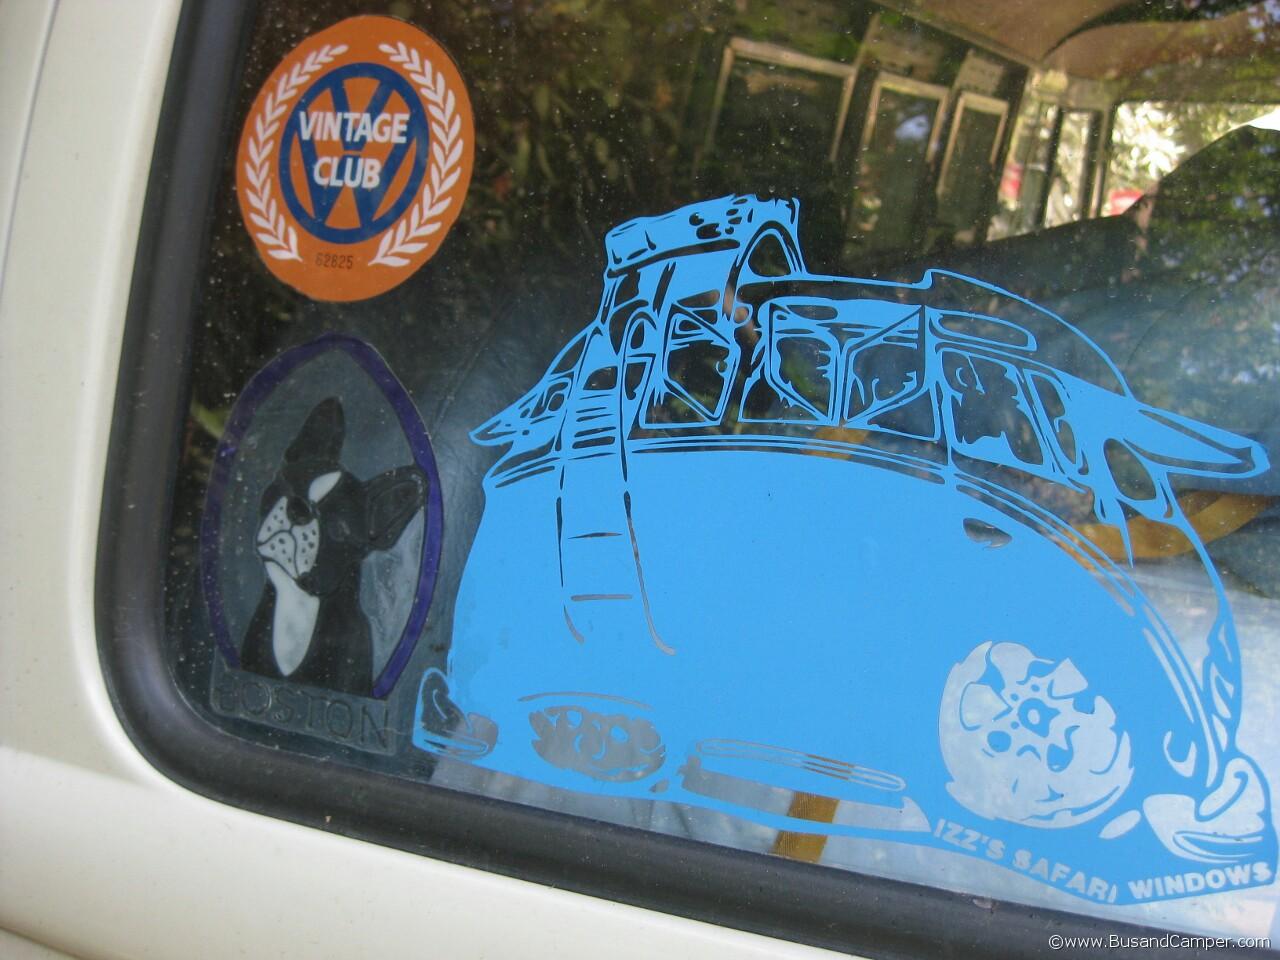 Vintage VW Club sticker 37